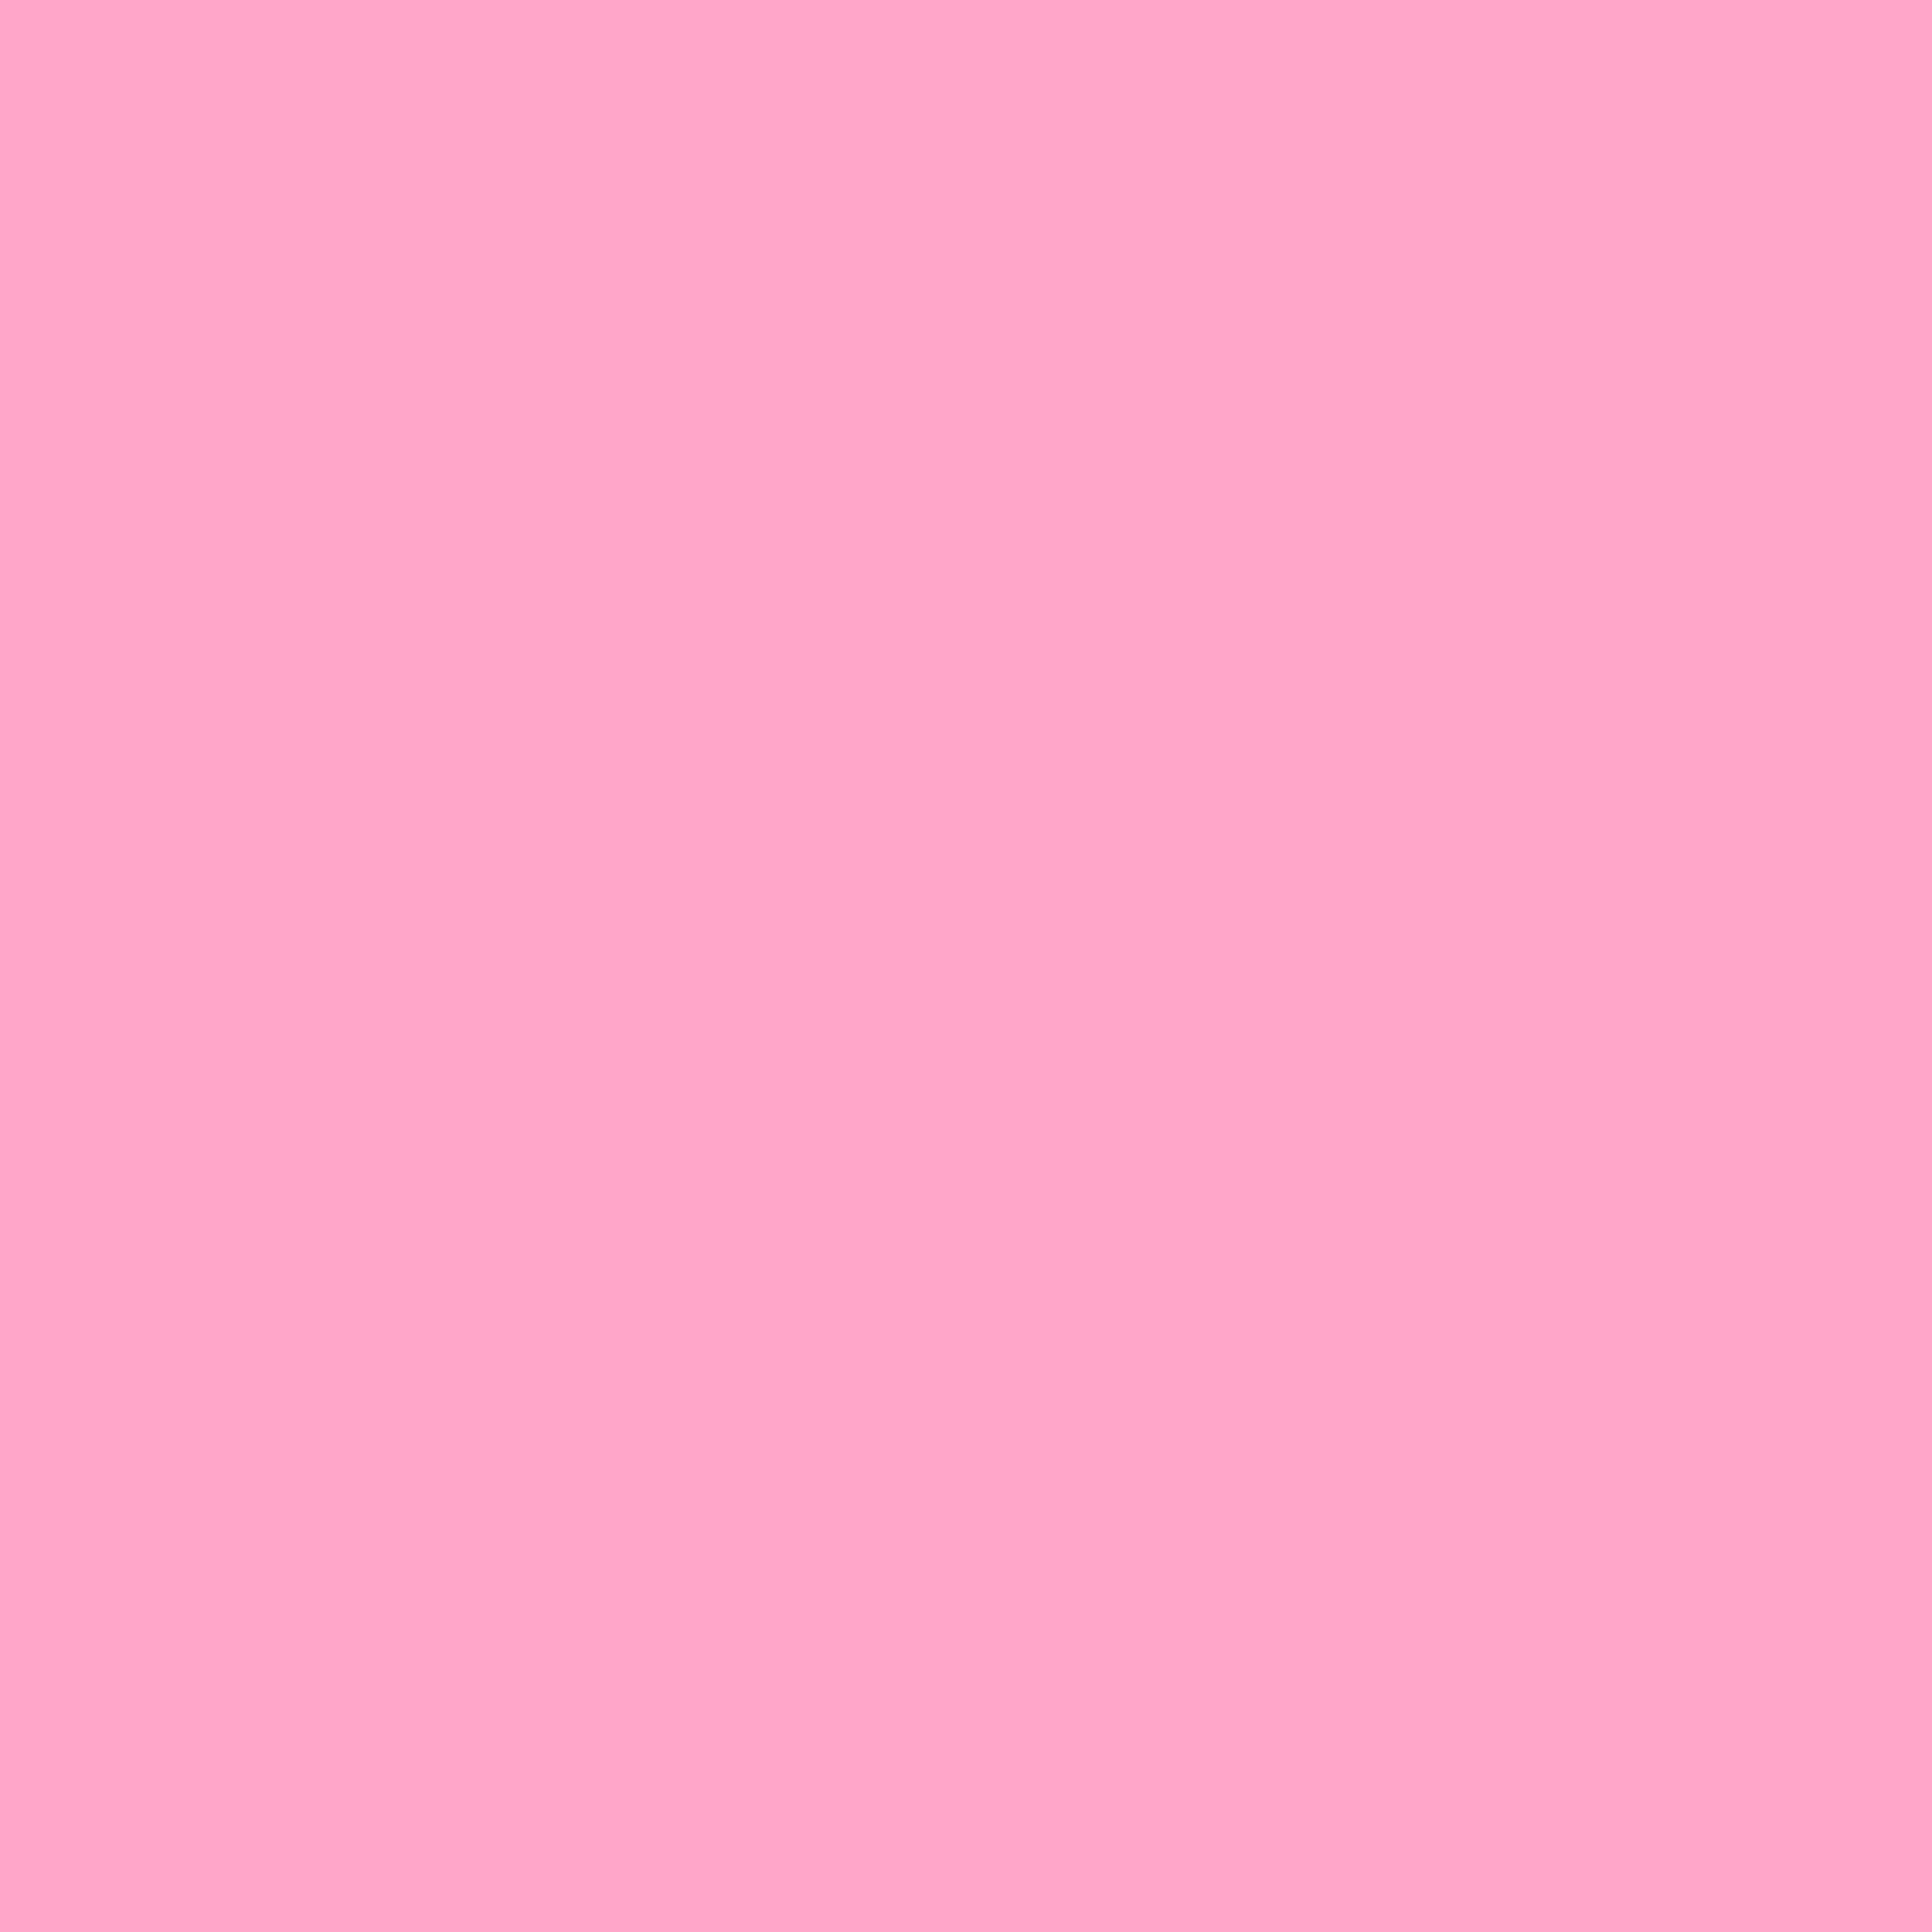 3600x3600 Carnation Pink Solid Color Background